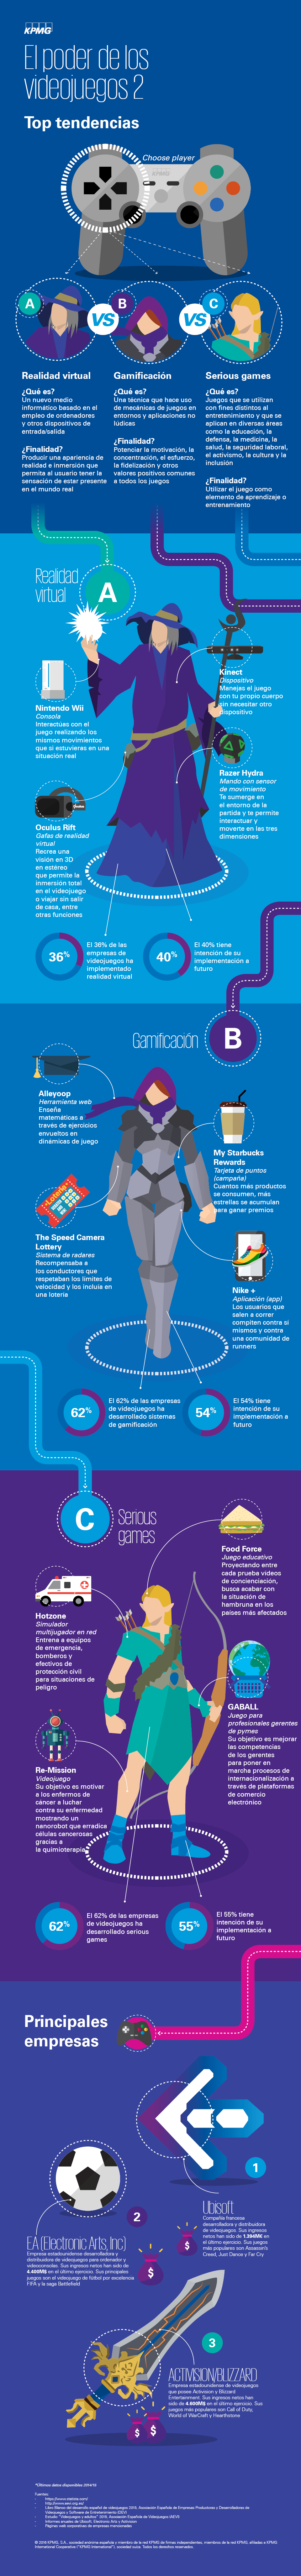 infografia-videojuegos2